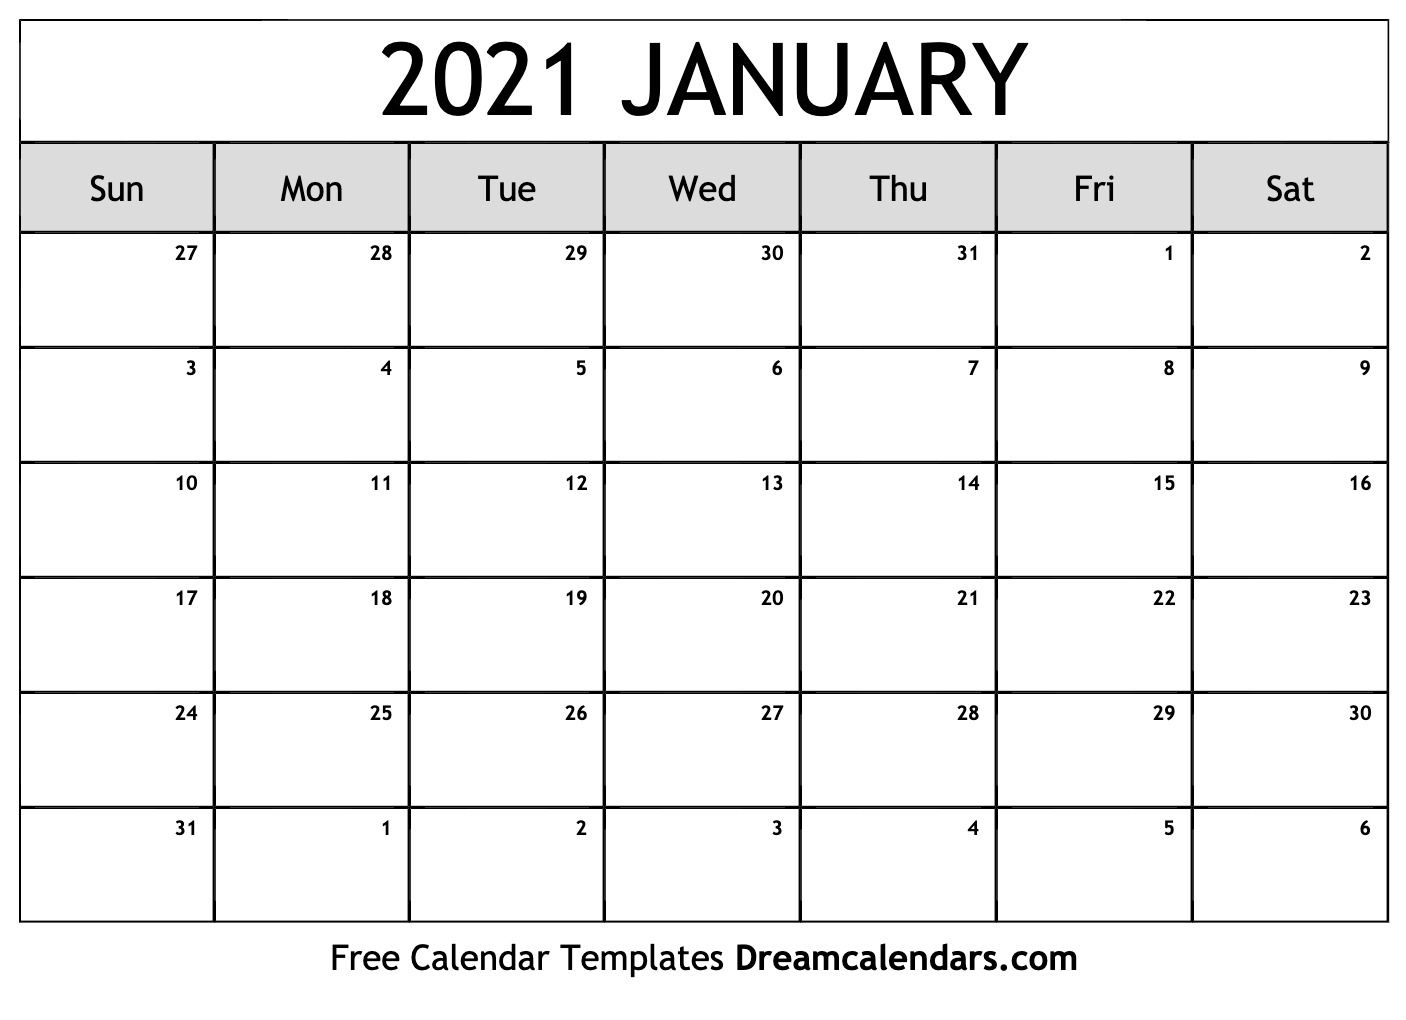 January 2021 Calendar   Free Blank Printable Templates